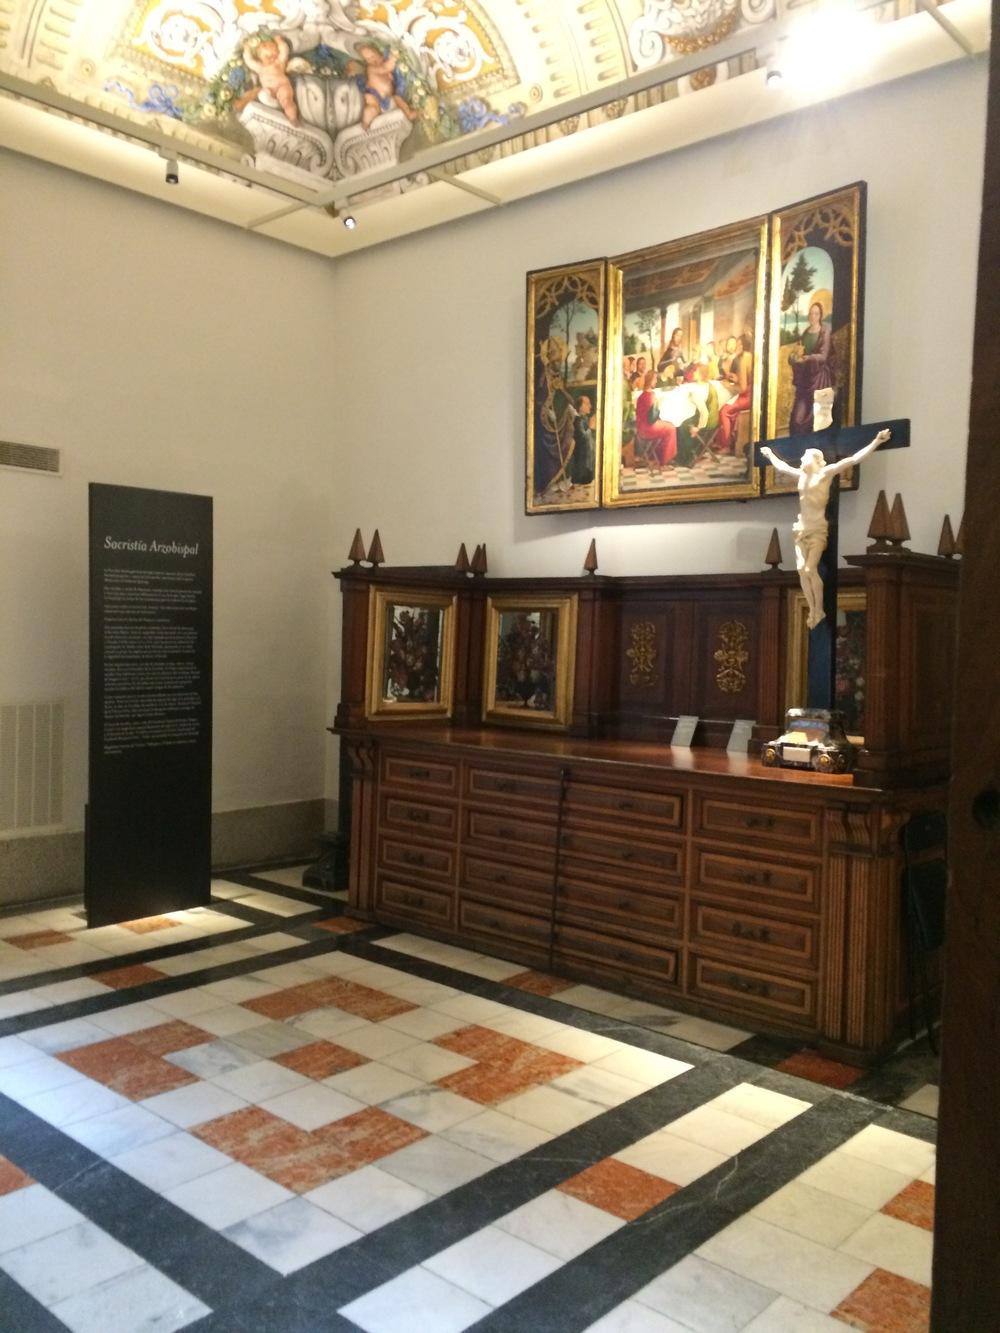 Ypunto_Sacristia_Mayor_Toledo_11.jpg